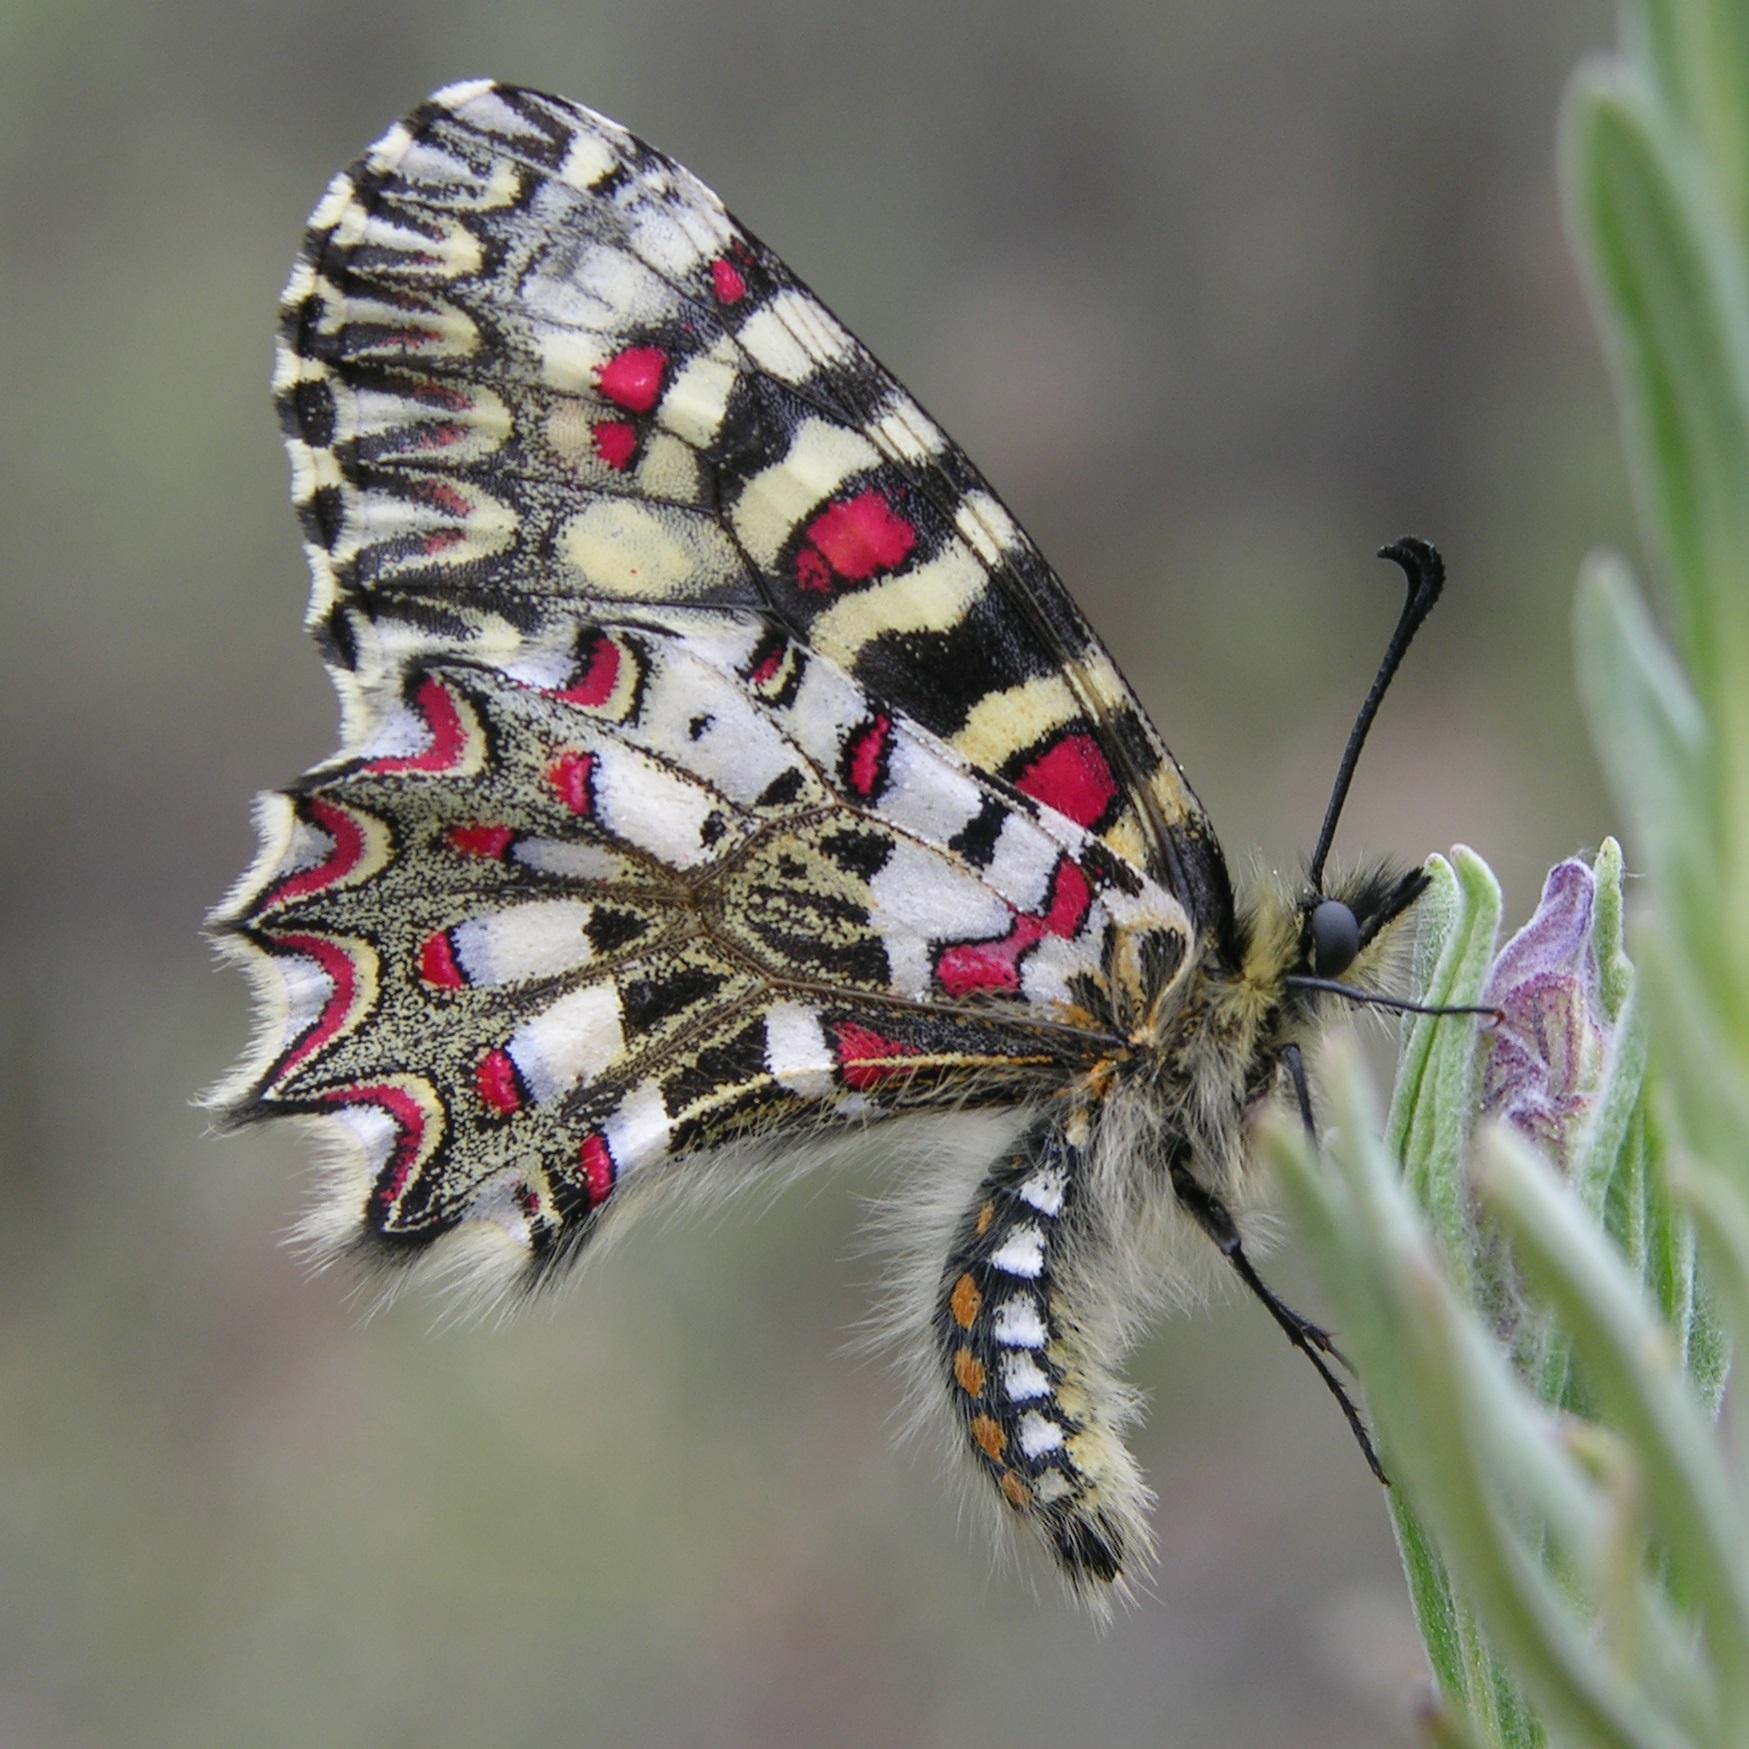 Ejemplar de 'Zerynthia rumina'. Imagen: David Gutiérrez / IEO